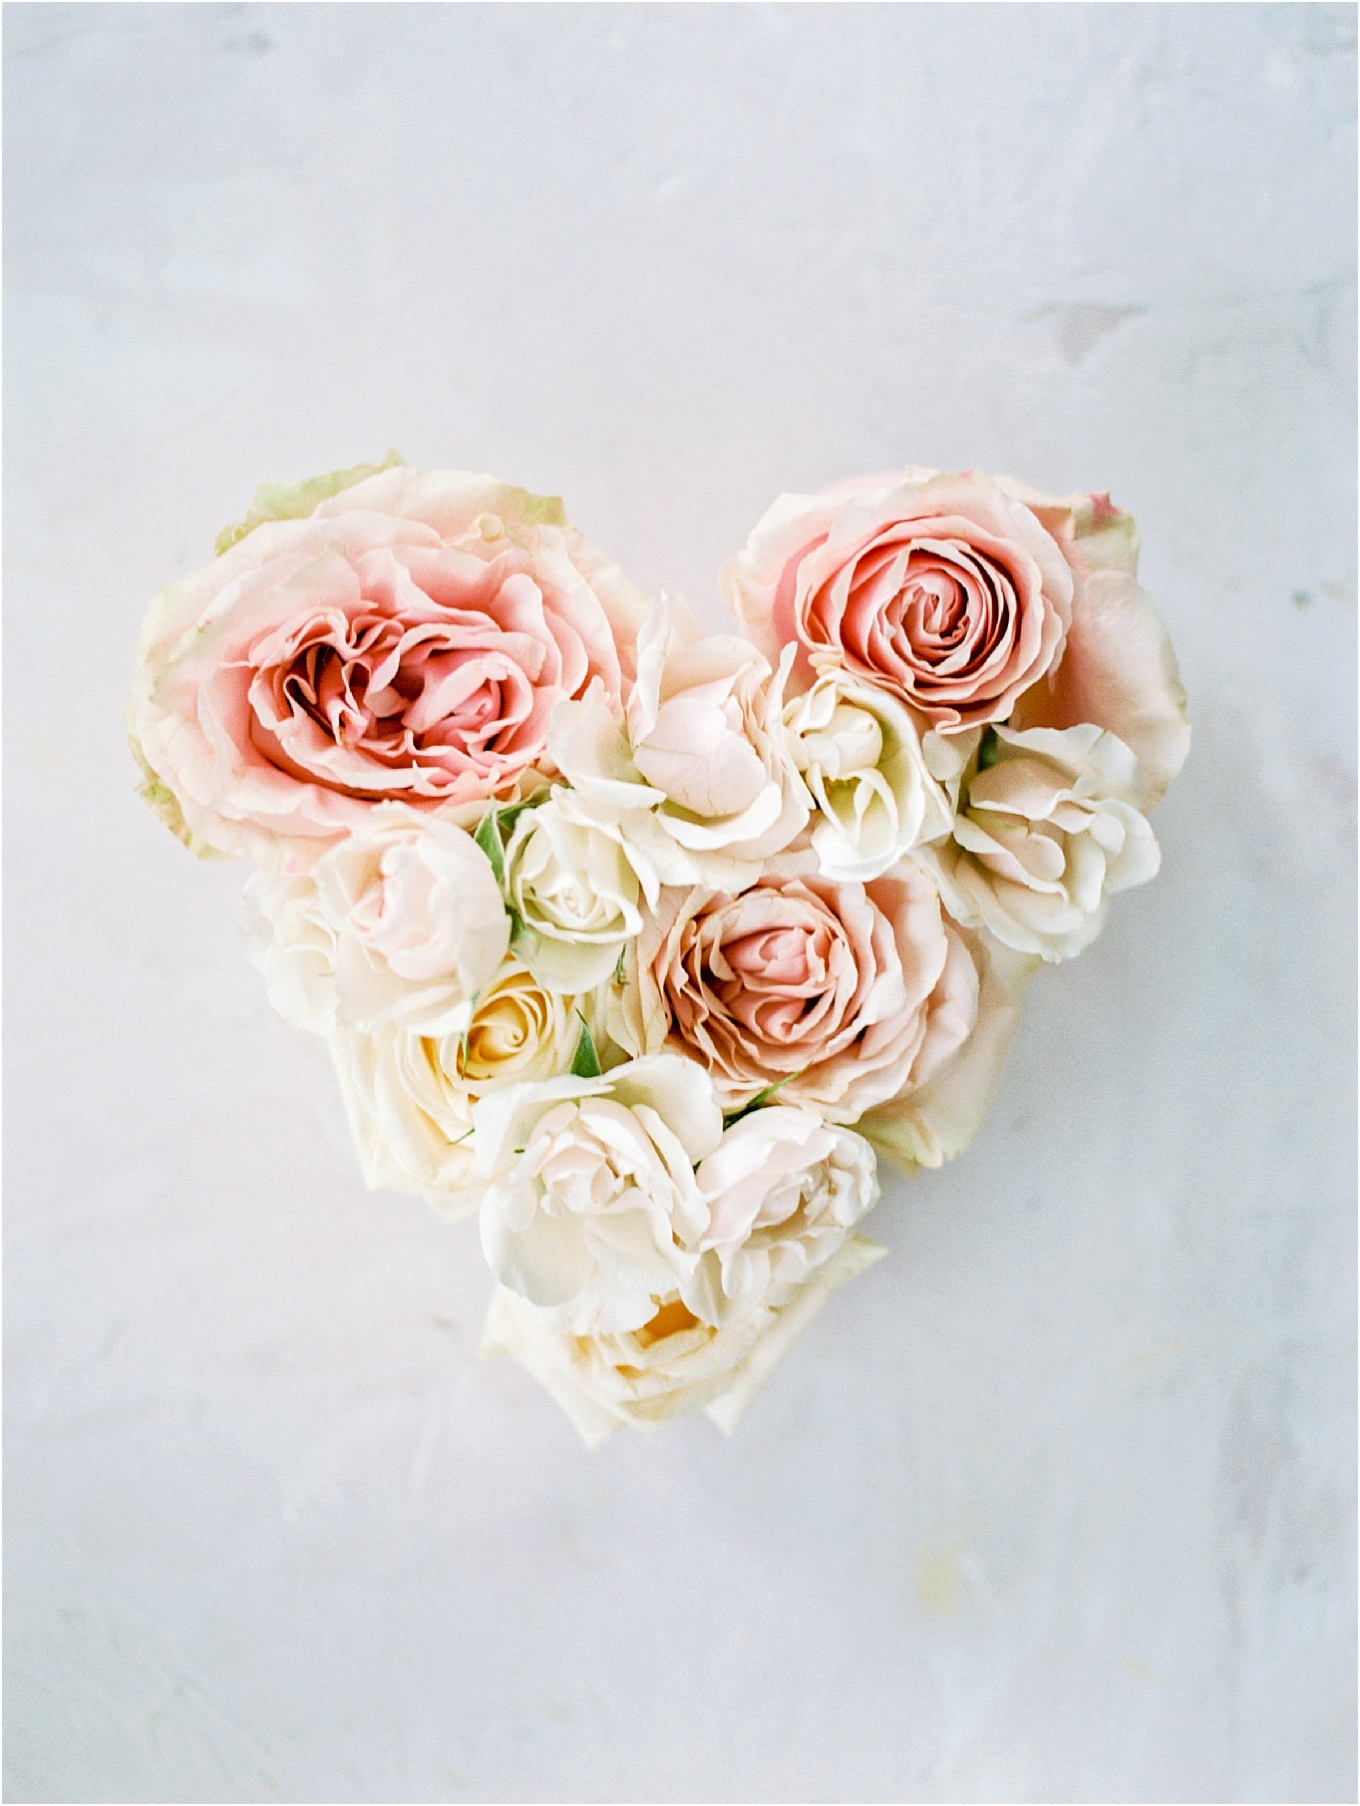 Lisa Silva Photography- Ponte Vedra Beach, St. Augustine and Jacksonville, Florida Fine Art Film Wedding and Boudoir Photography- Elegant Blush  Wedding at Epping Forest Yacht Club in Jacksonville, Florida_0001.jpg